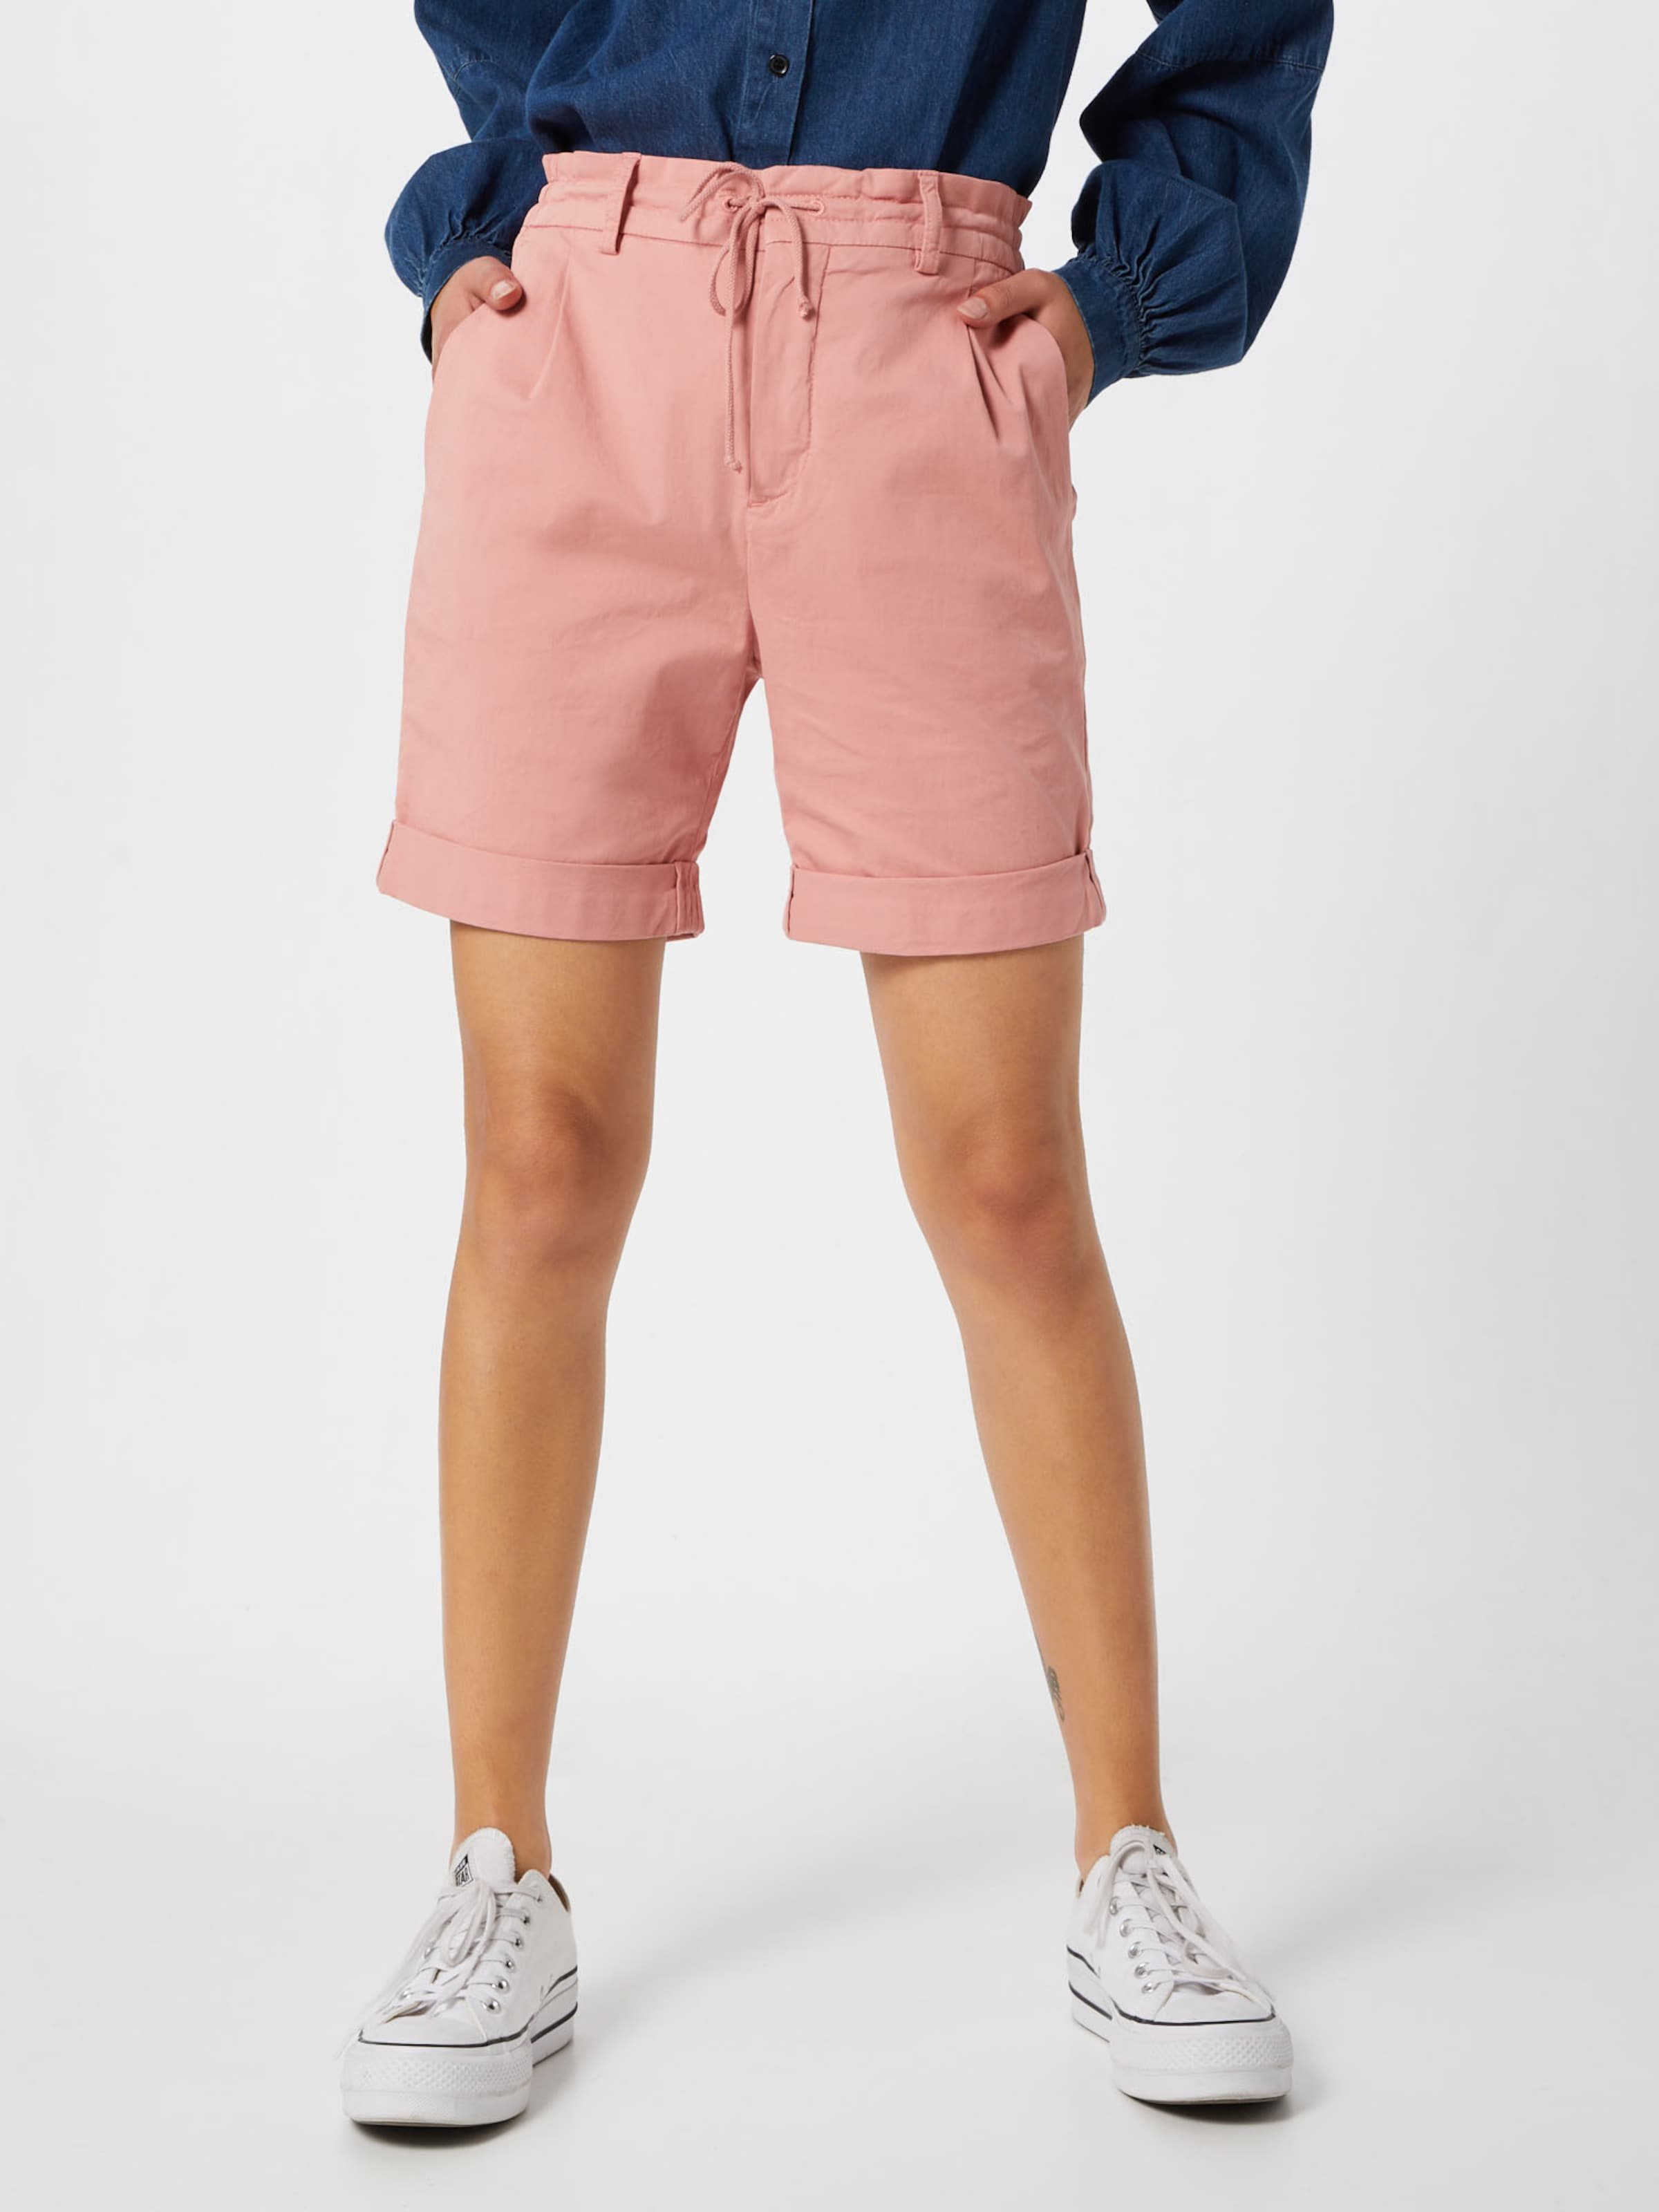 Rosa 'trainee' Drykorn Shorts In Drykorn Drykorn Rosa Shorts 'trainee' In 0wvmNn8